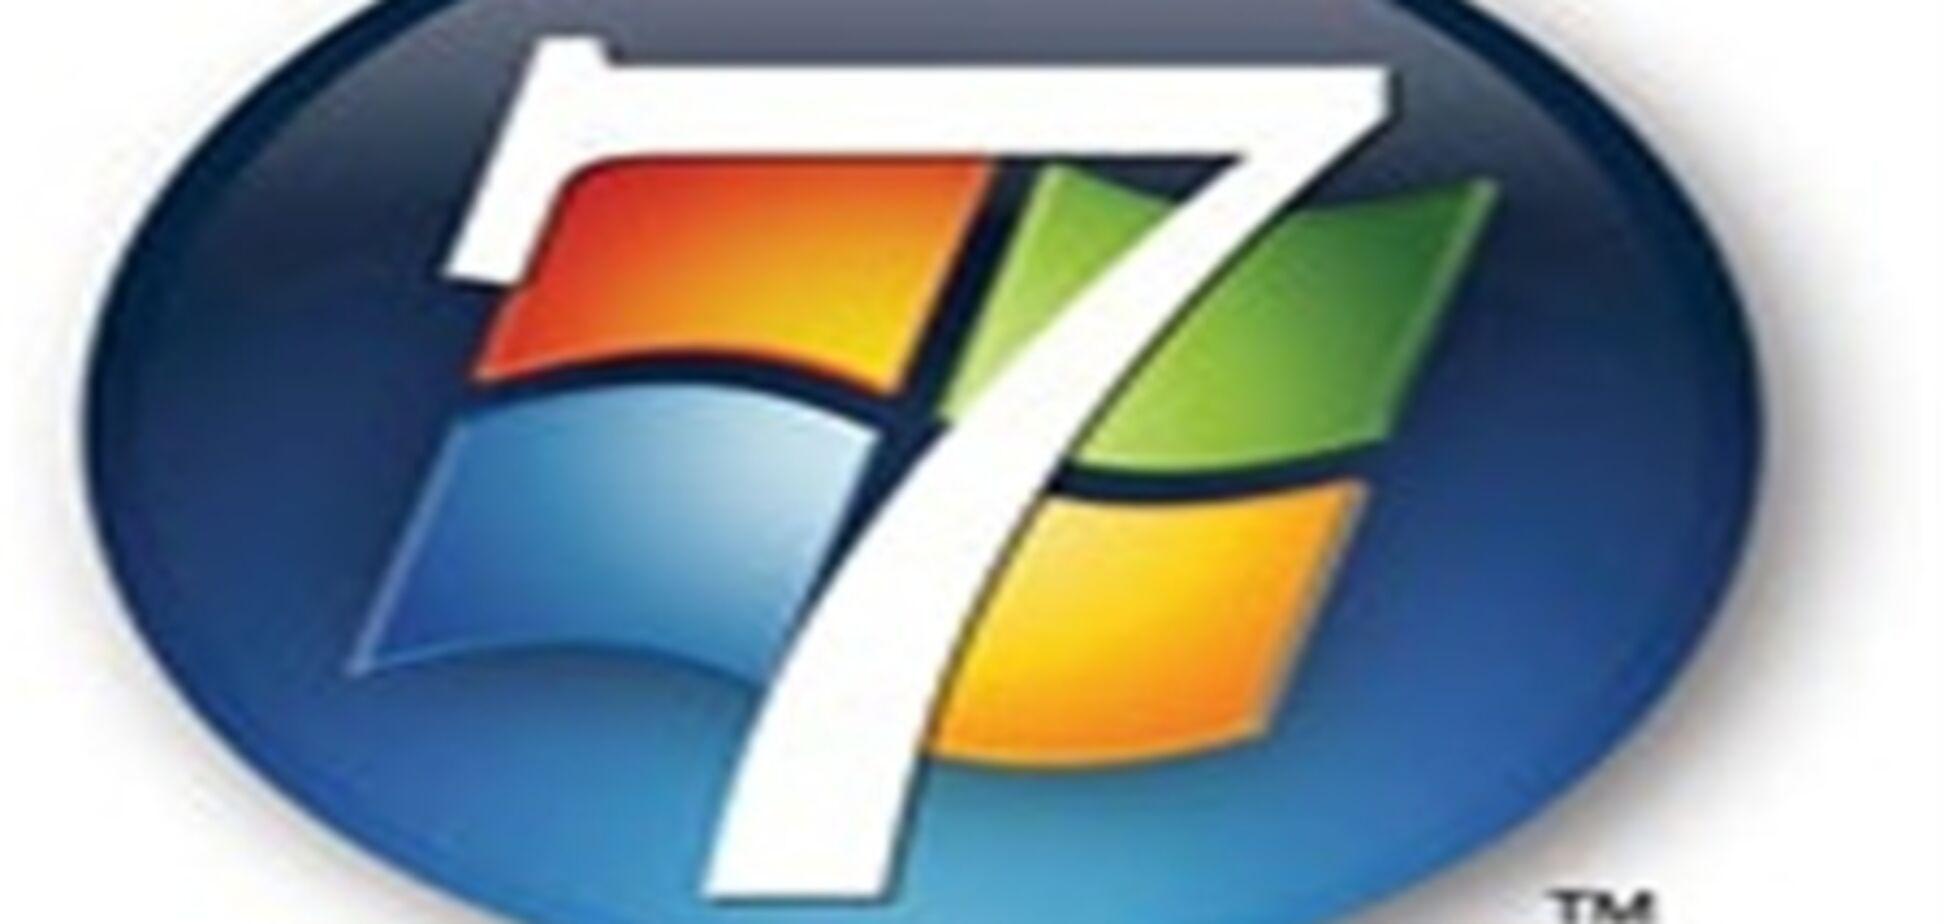 Microsoft отрицает наличие критической ошибки в Windows 7